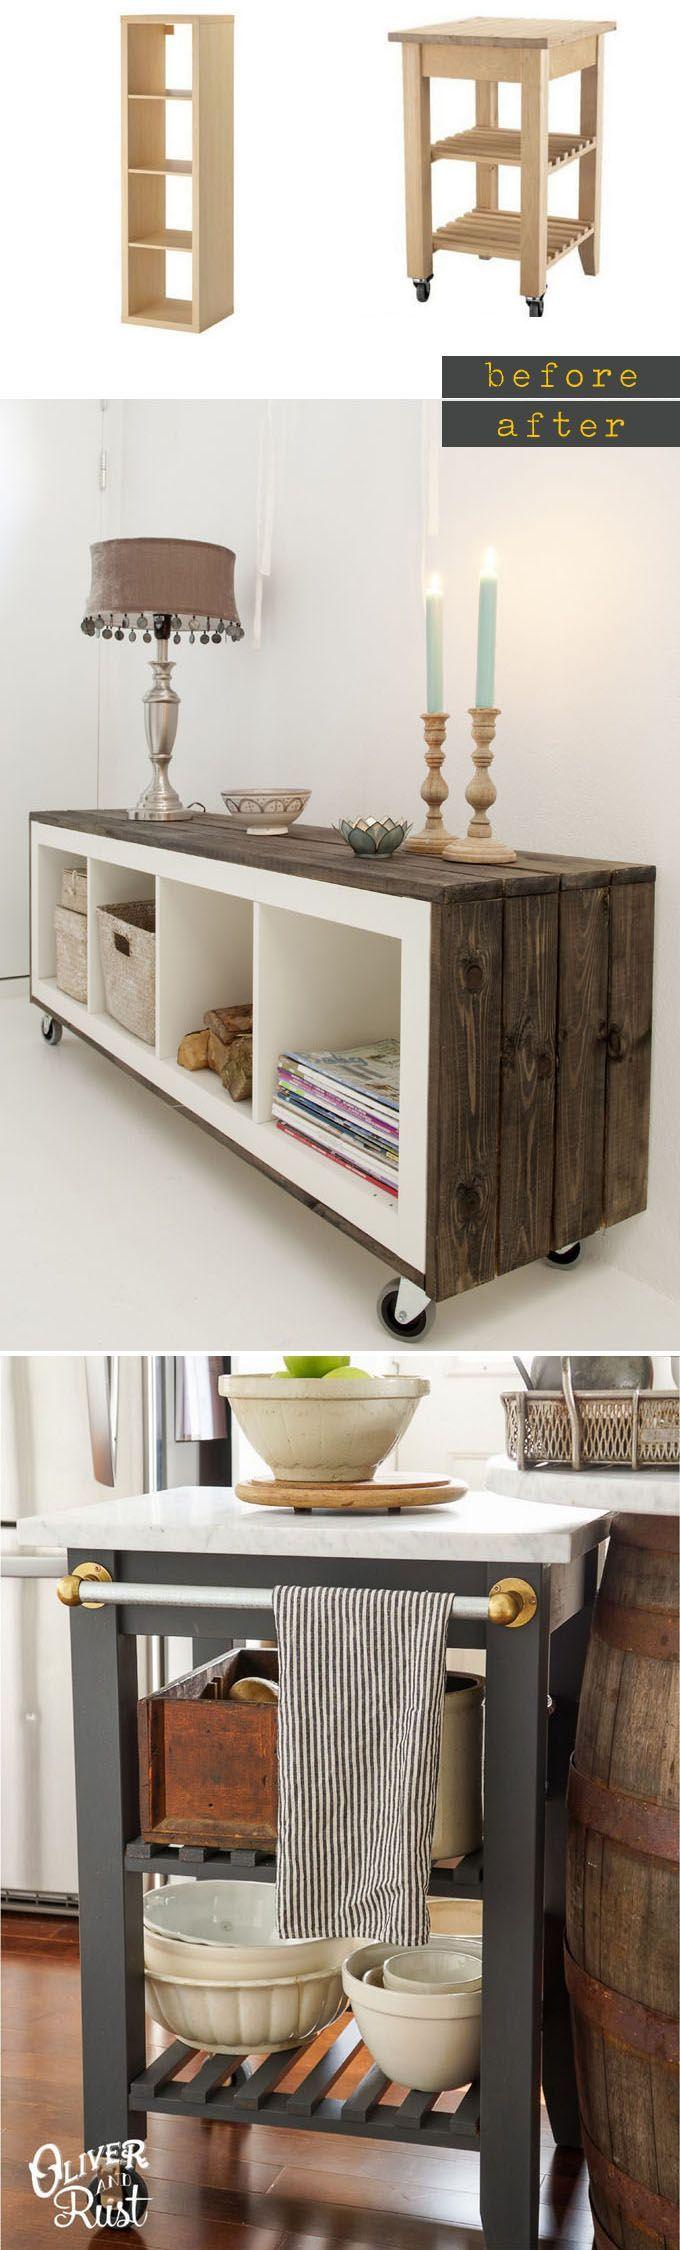 936 best DIY Furniture Ideas images on Pinterest | Furniture ...